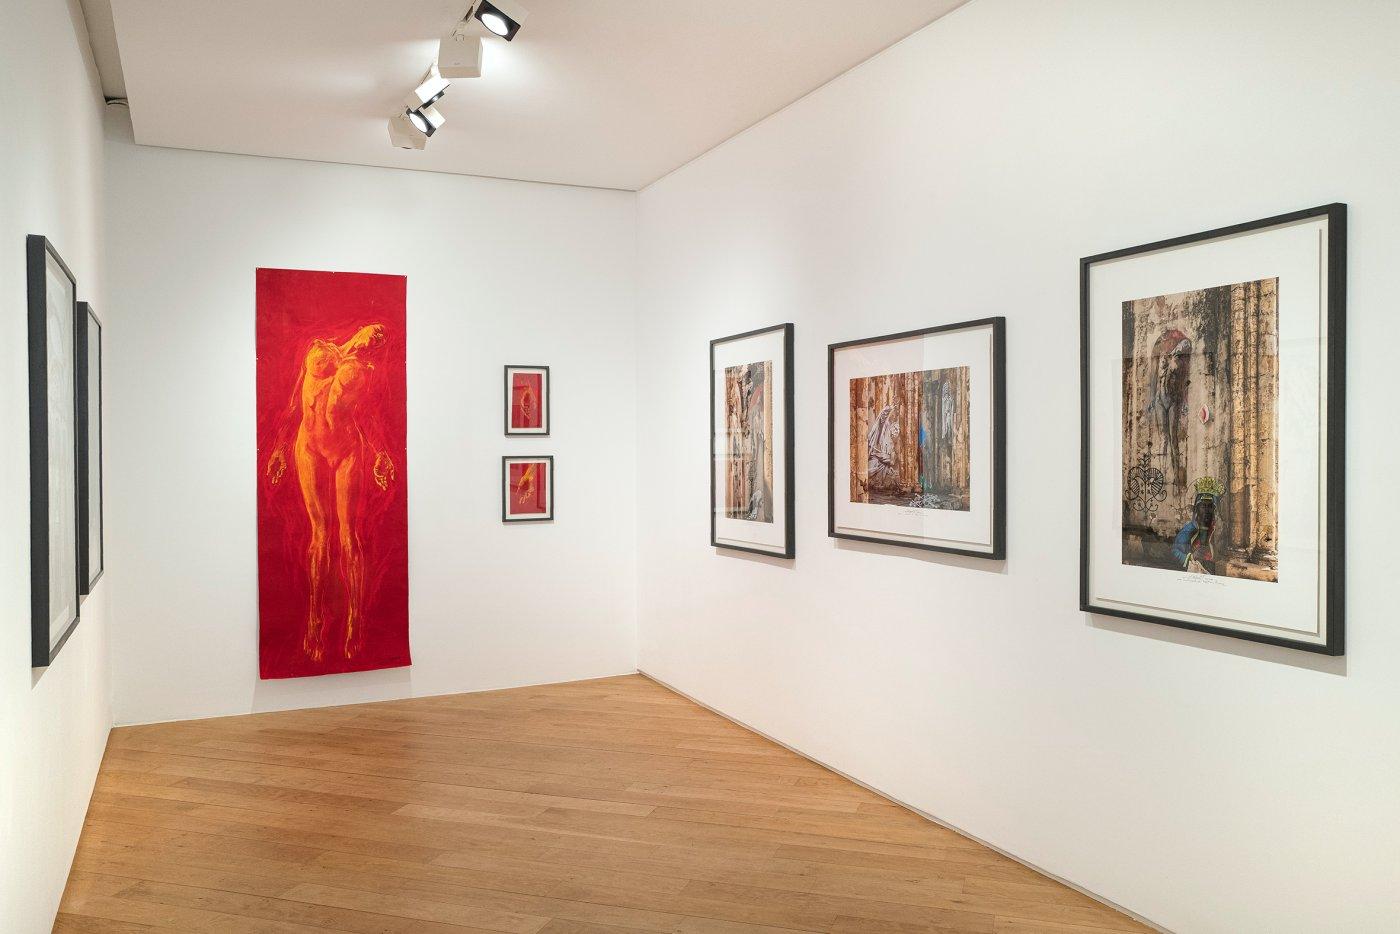 Galerie Lelong Co Matignon Ernest Pignon-Ernest 2